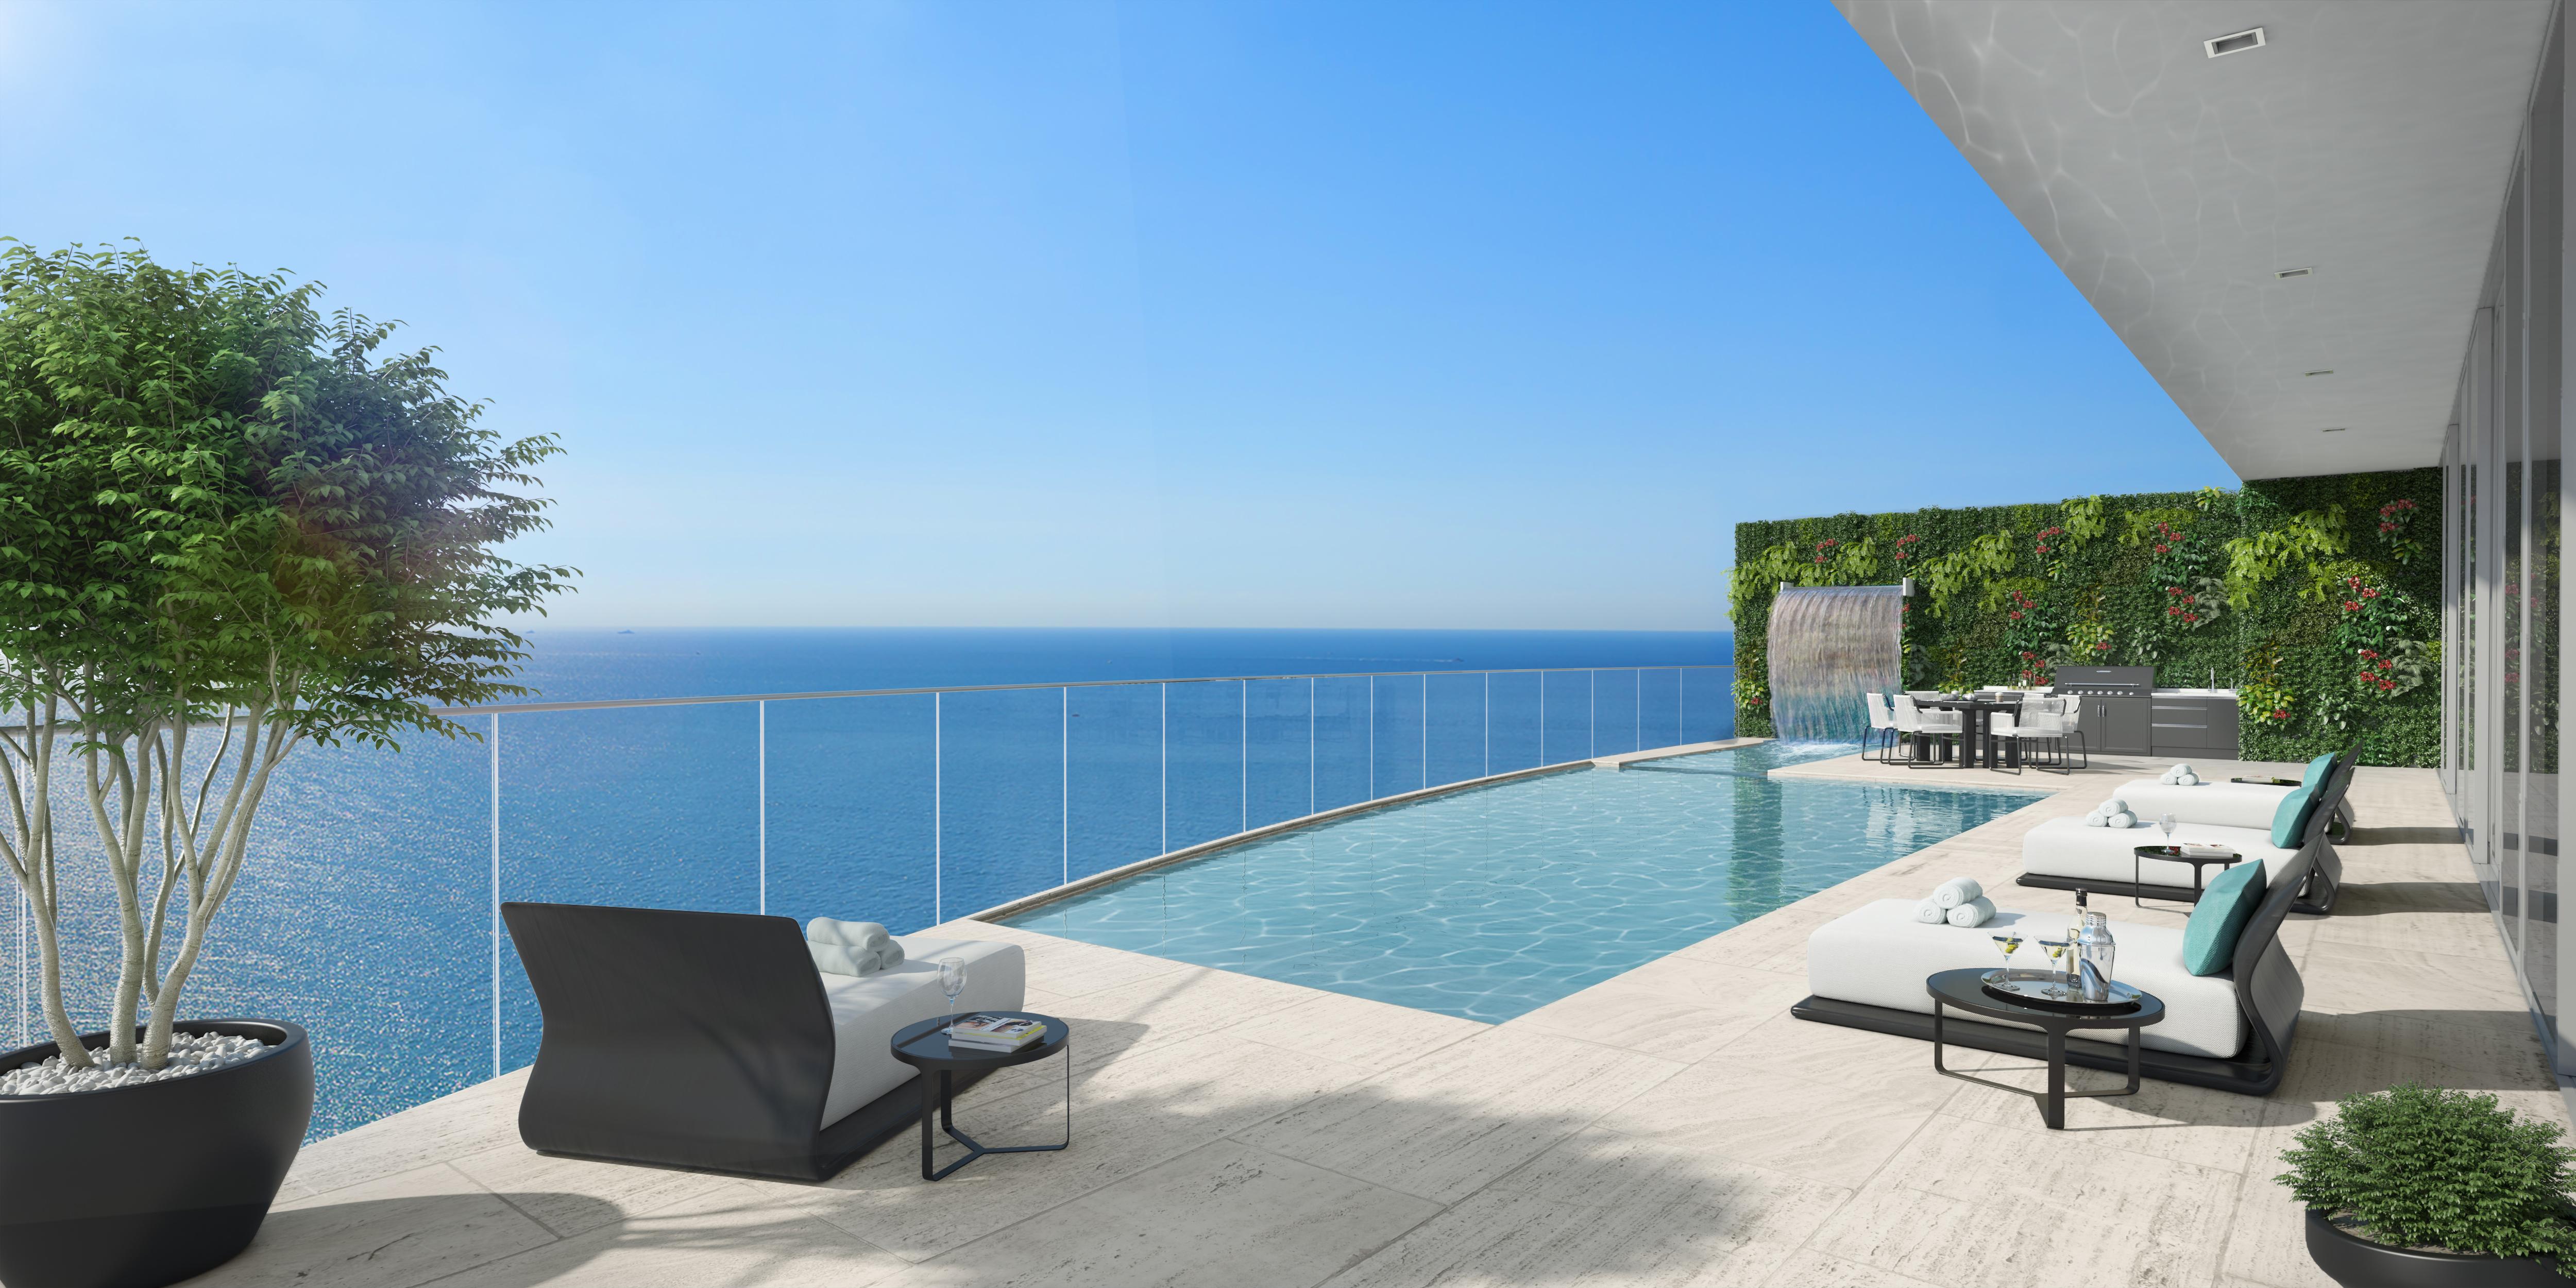 Trump-PalazzoDiAqualina-02-PH-Terrace-Pool-01